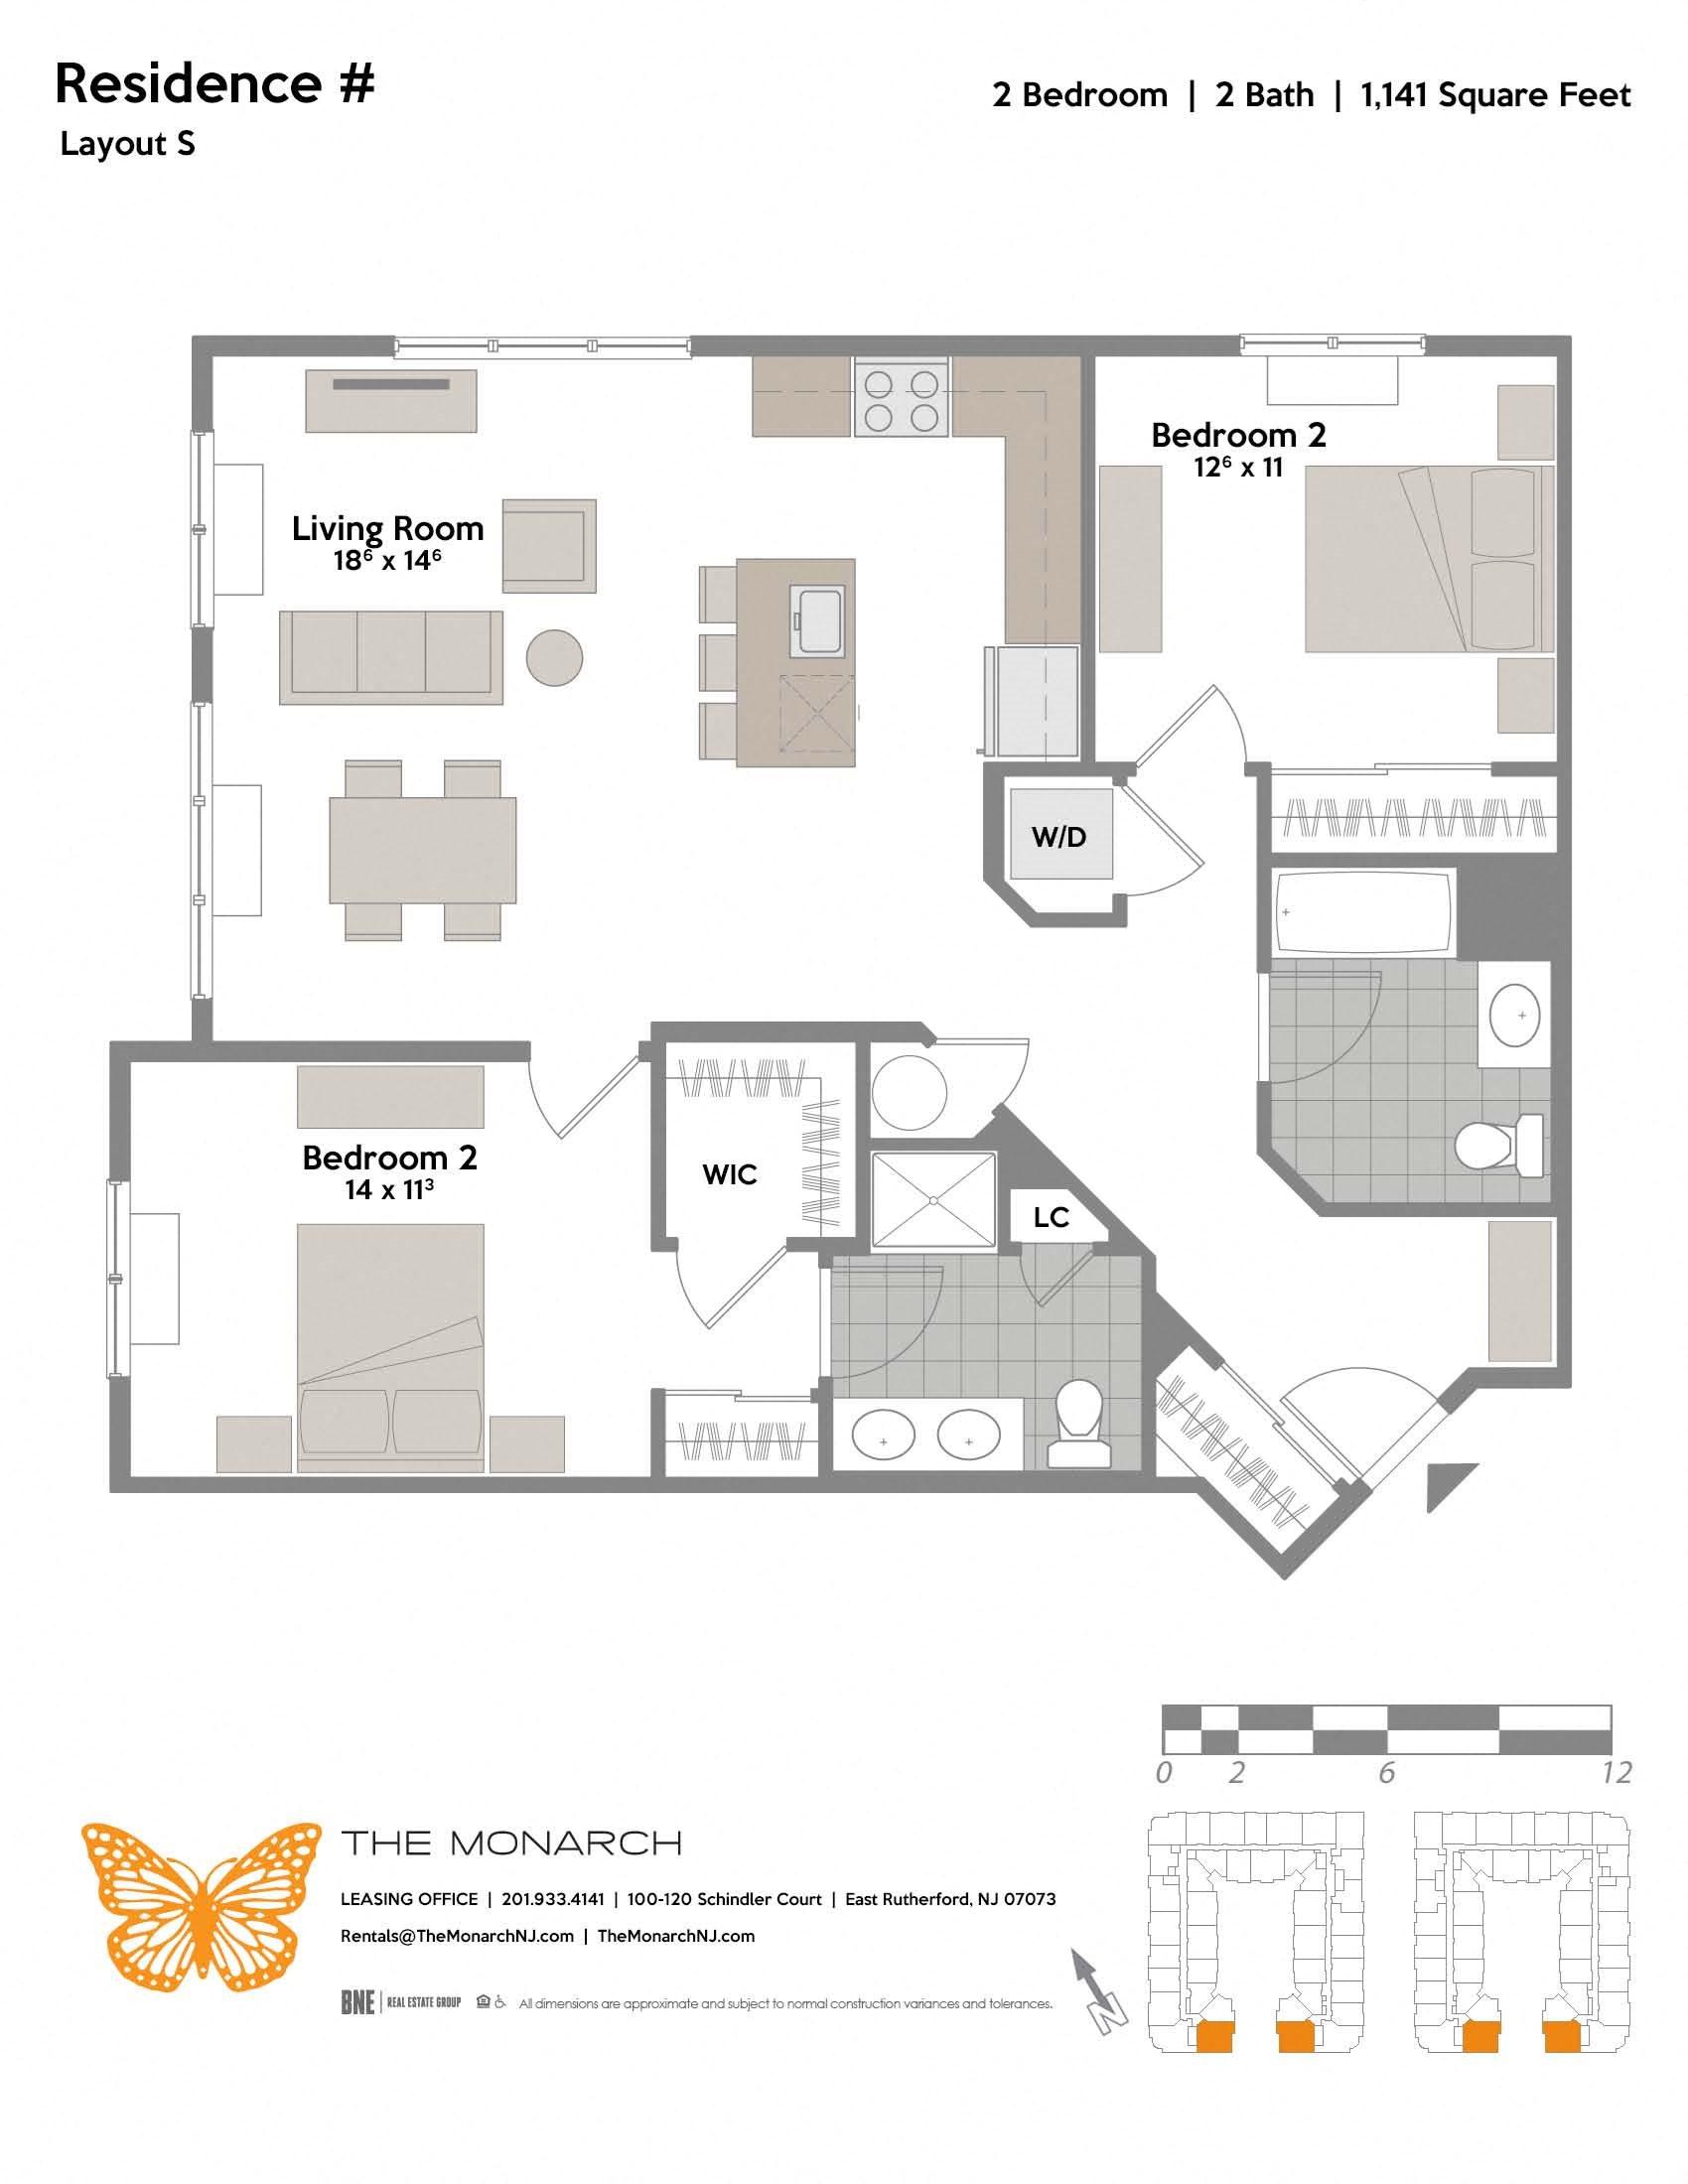 Layout S Floor Plan 8